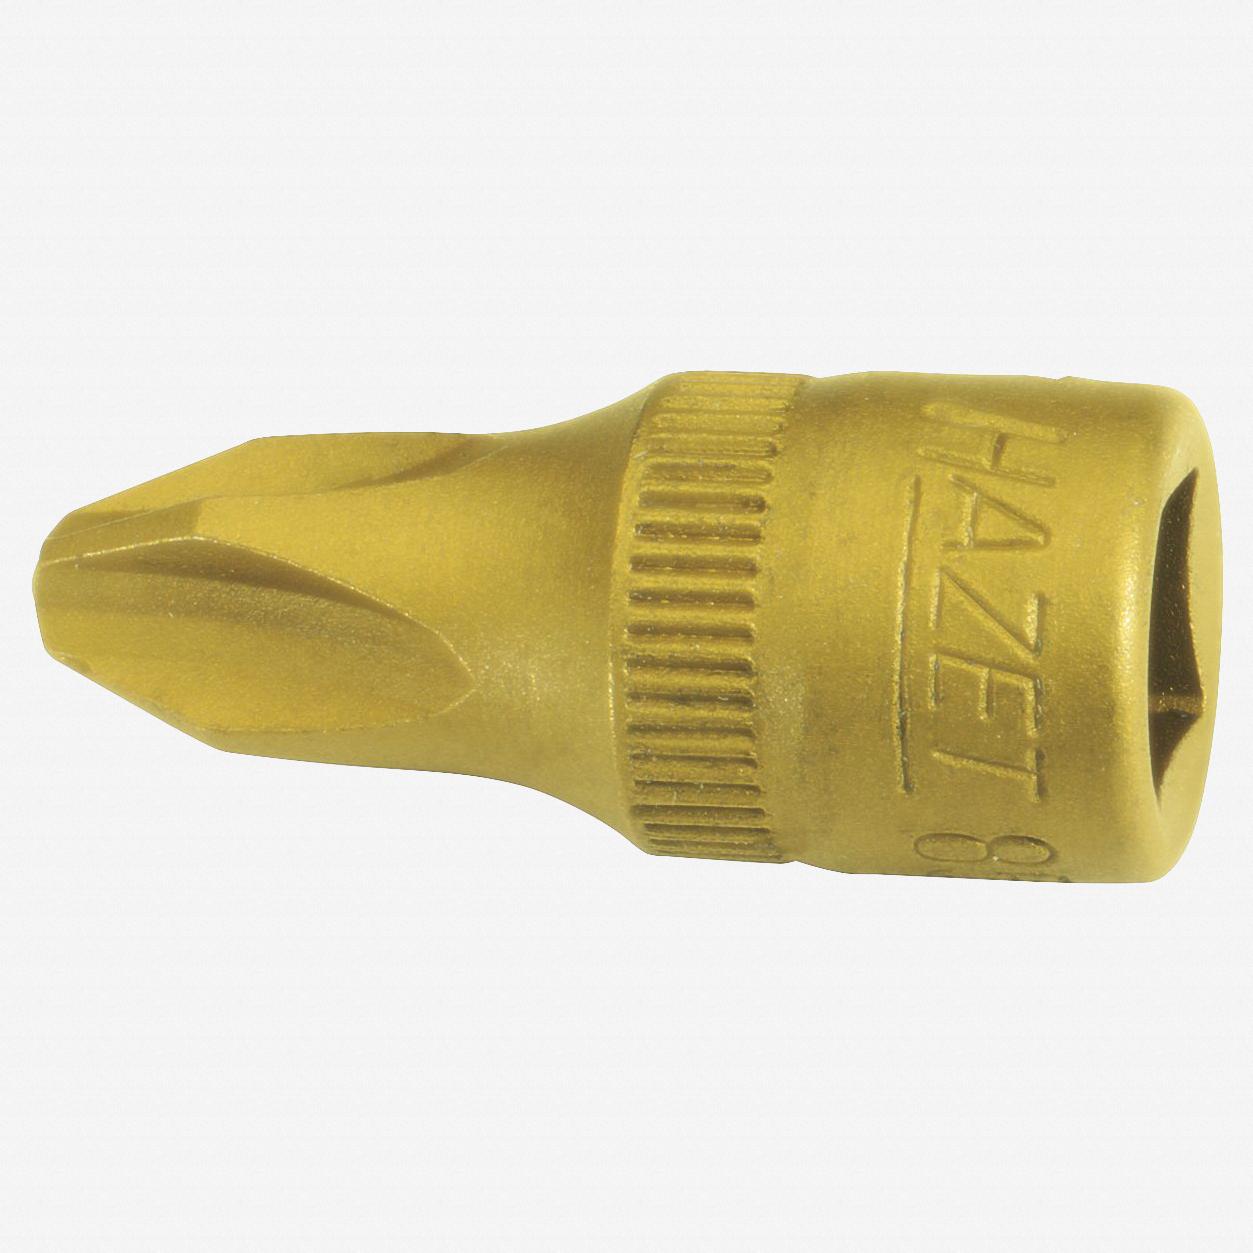 "Hazet 8506-PH1 PH #1 Phillips TiN 1/4"" Socket - KC Tool"